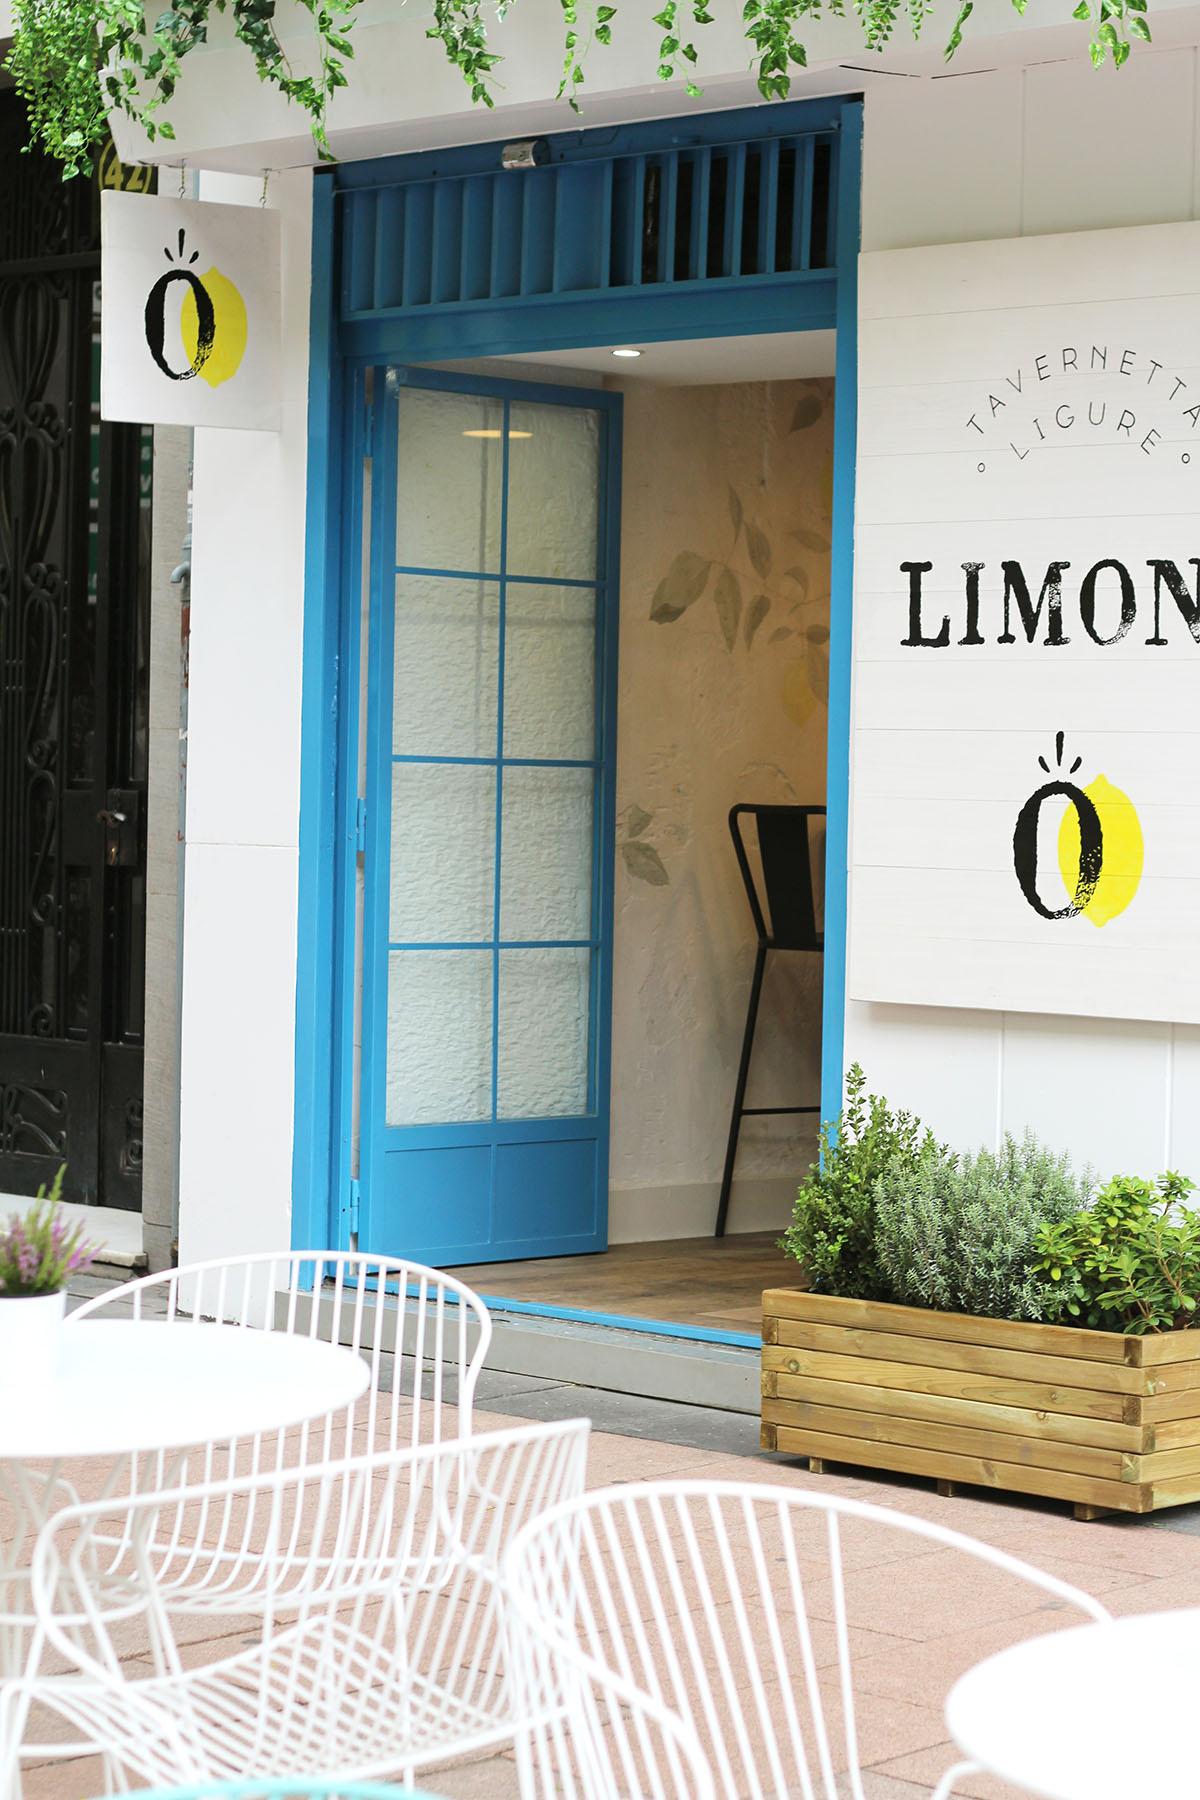 limone-madrid